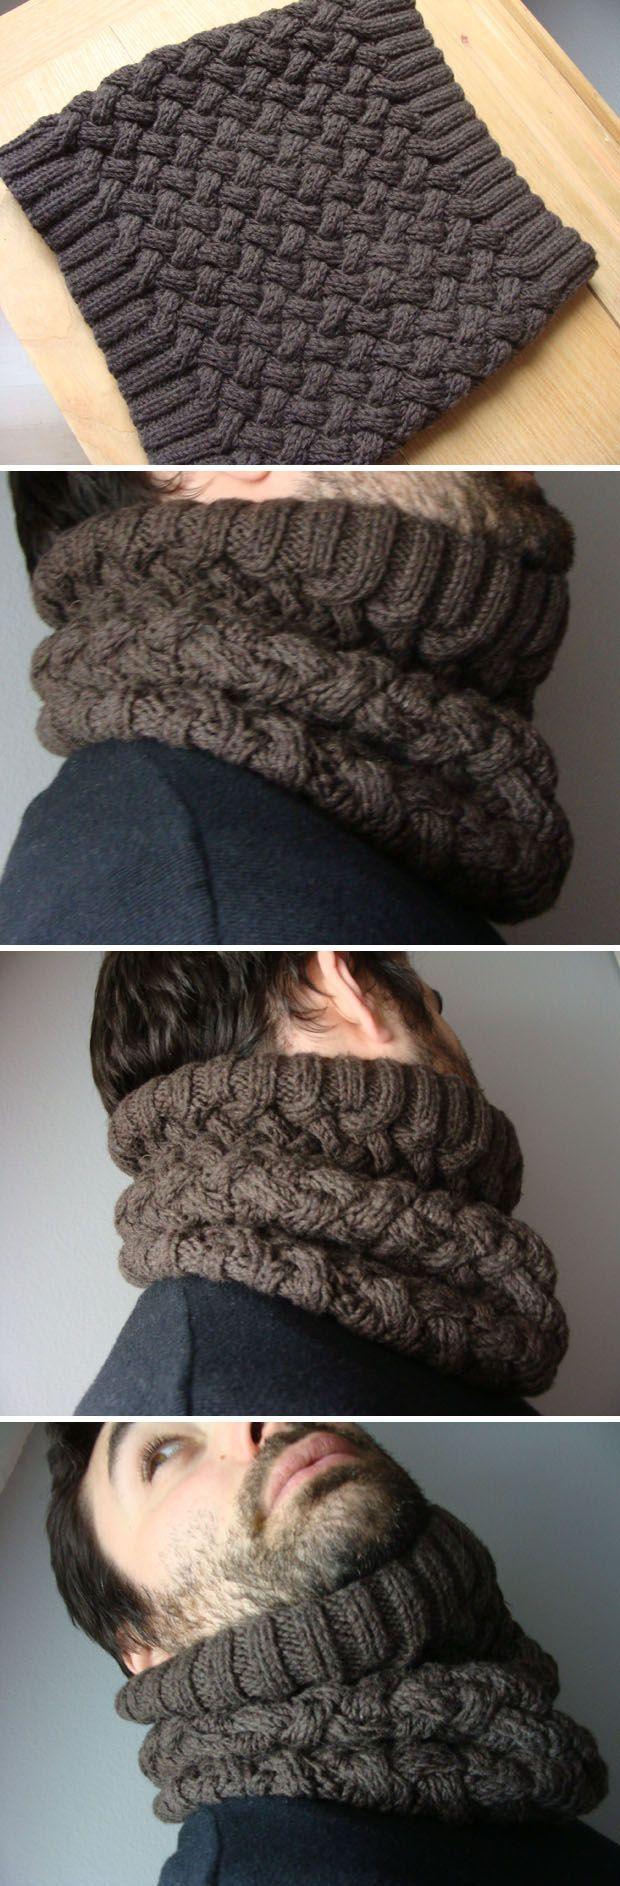 fdb17fcb67715c67bd9003b74a77b8fa--knitted-cowls-knit-cowl.jpg 620 1,886?? ?...